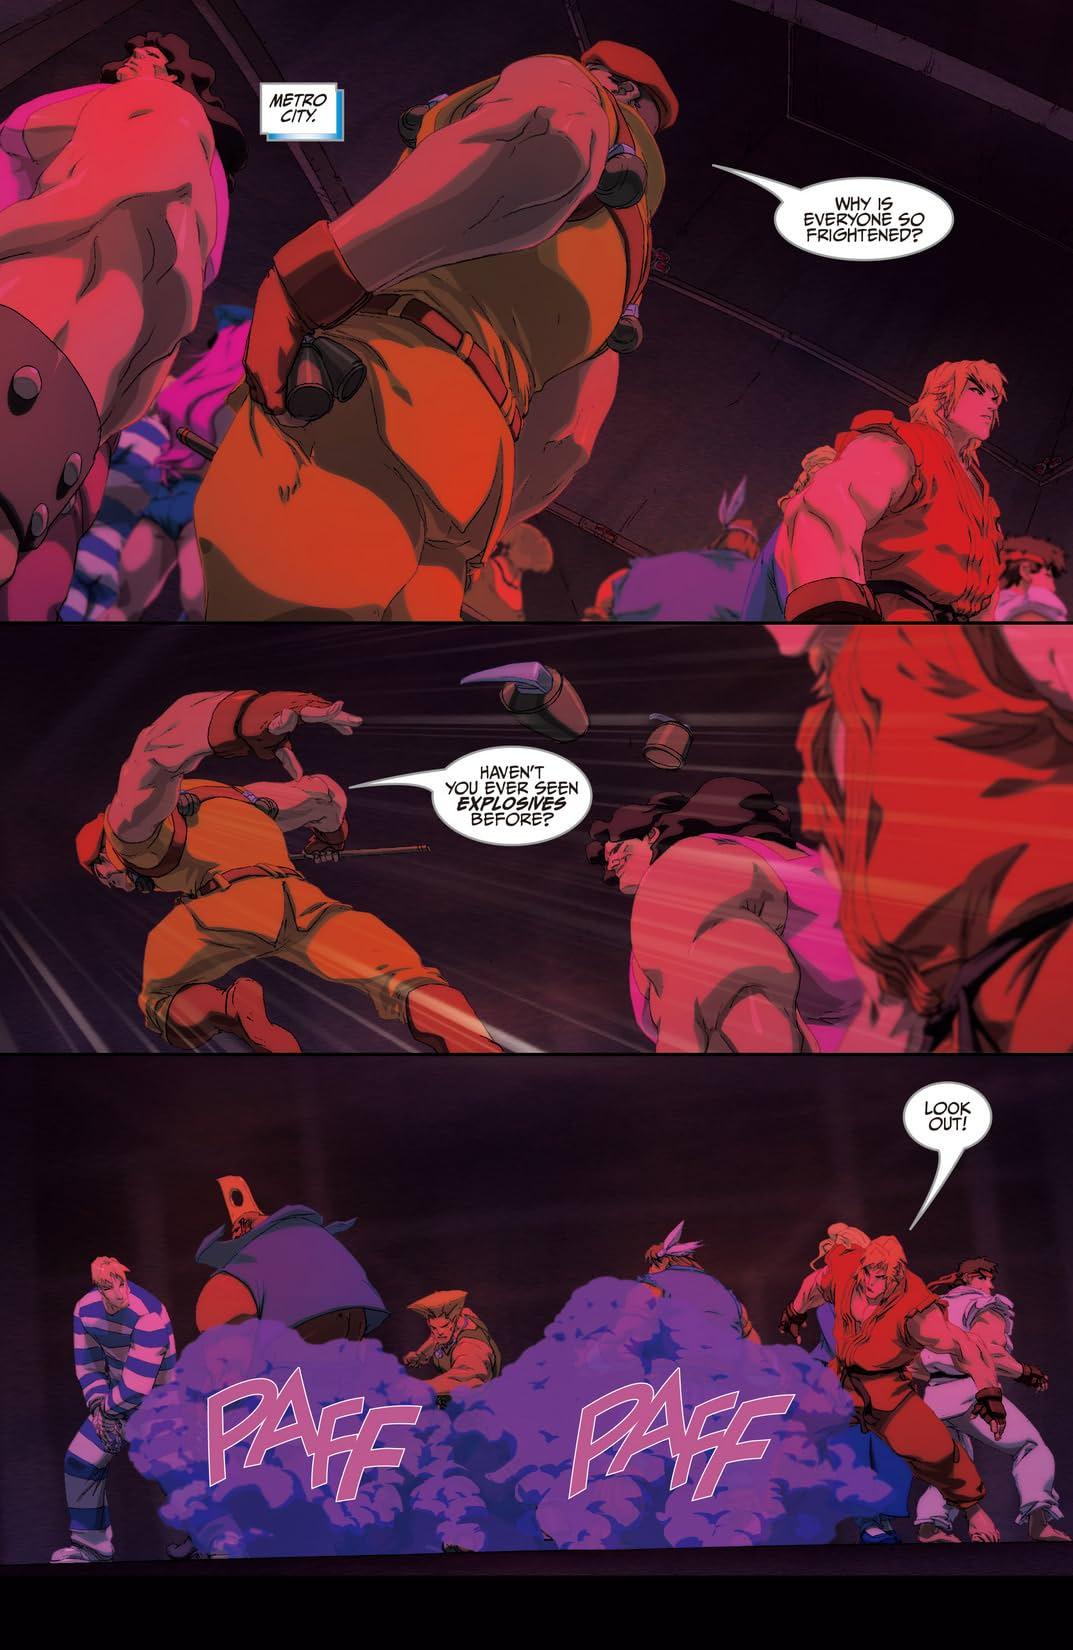 Street Fighter II Turbo #7